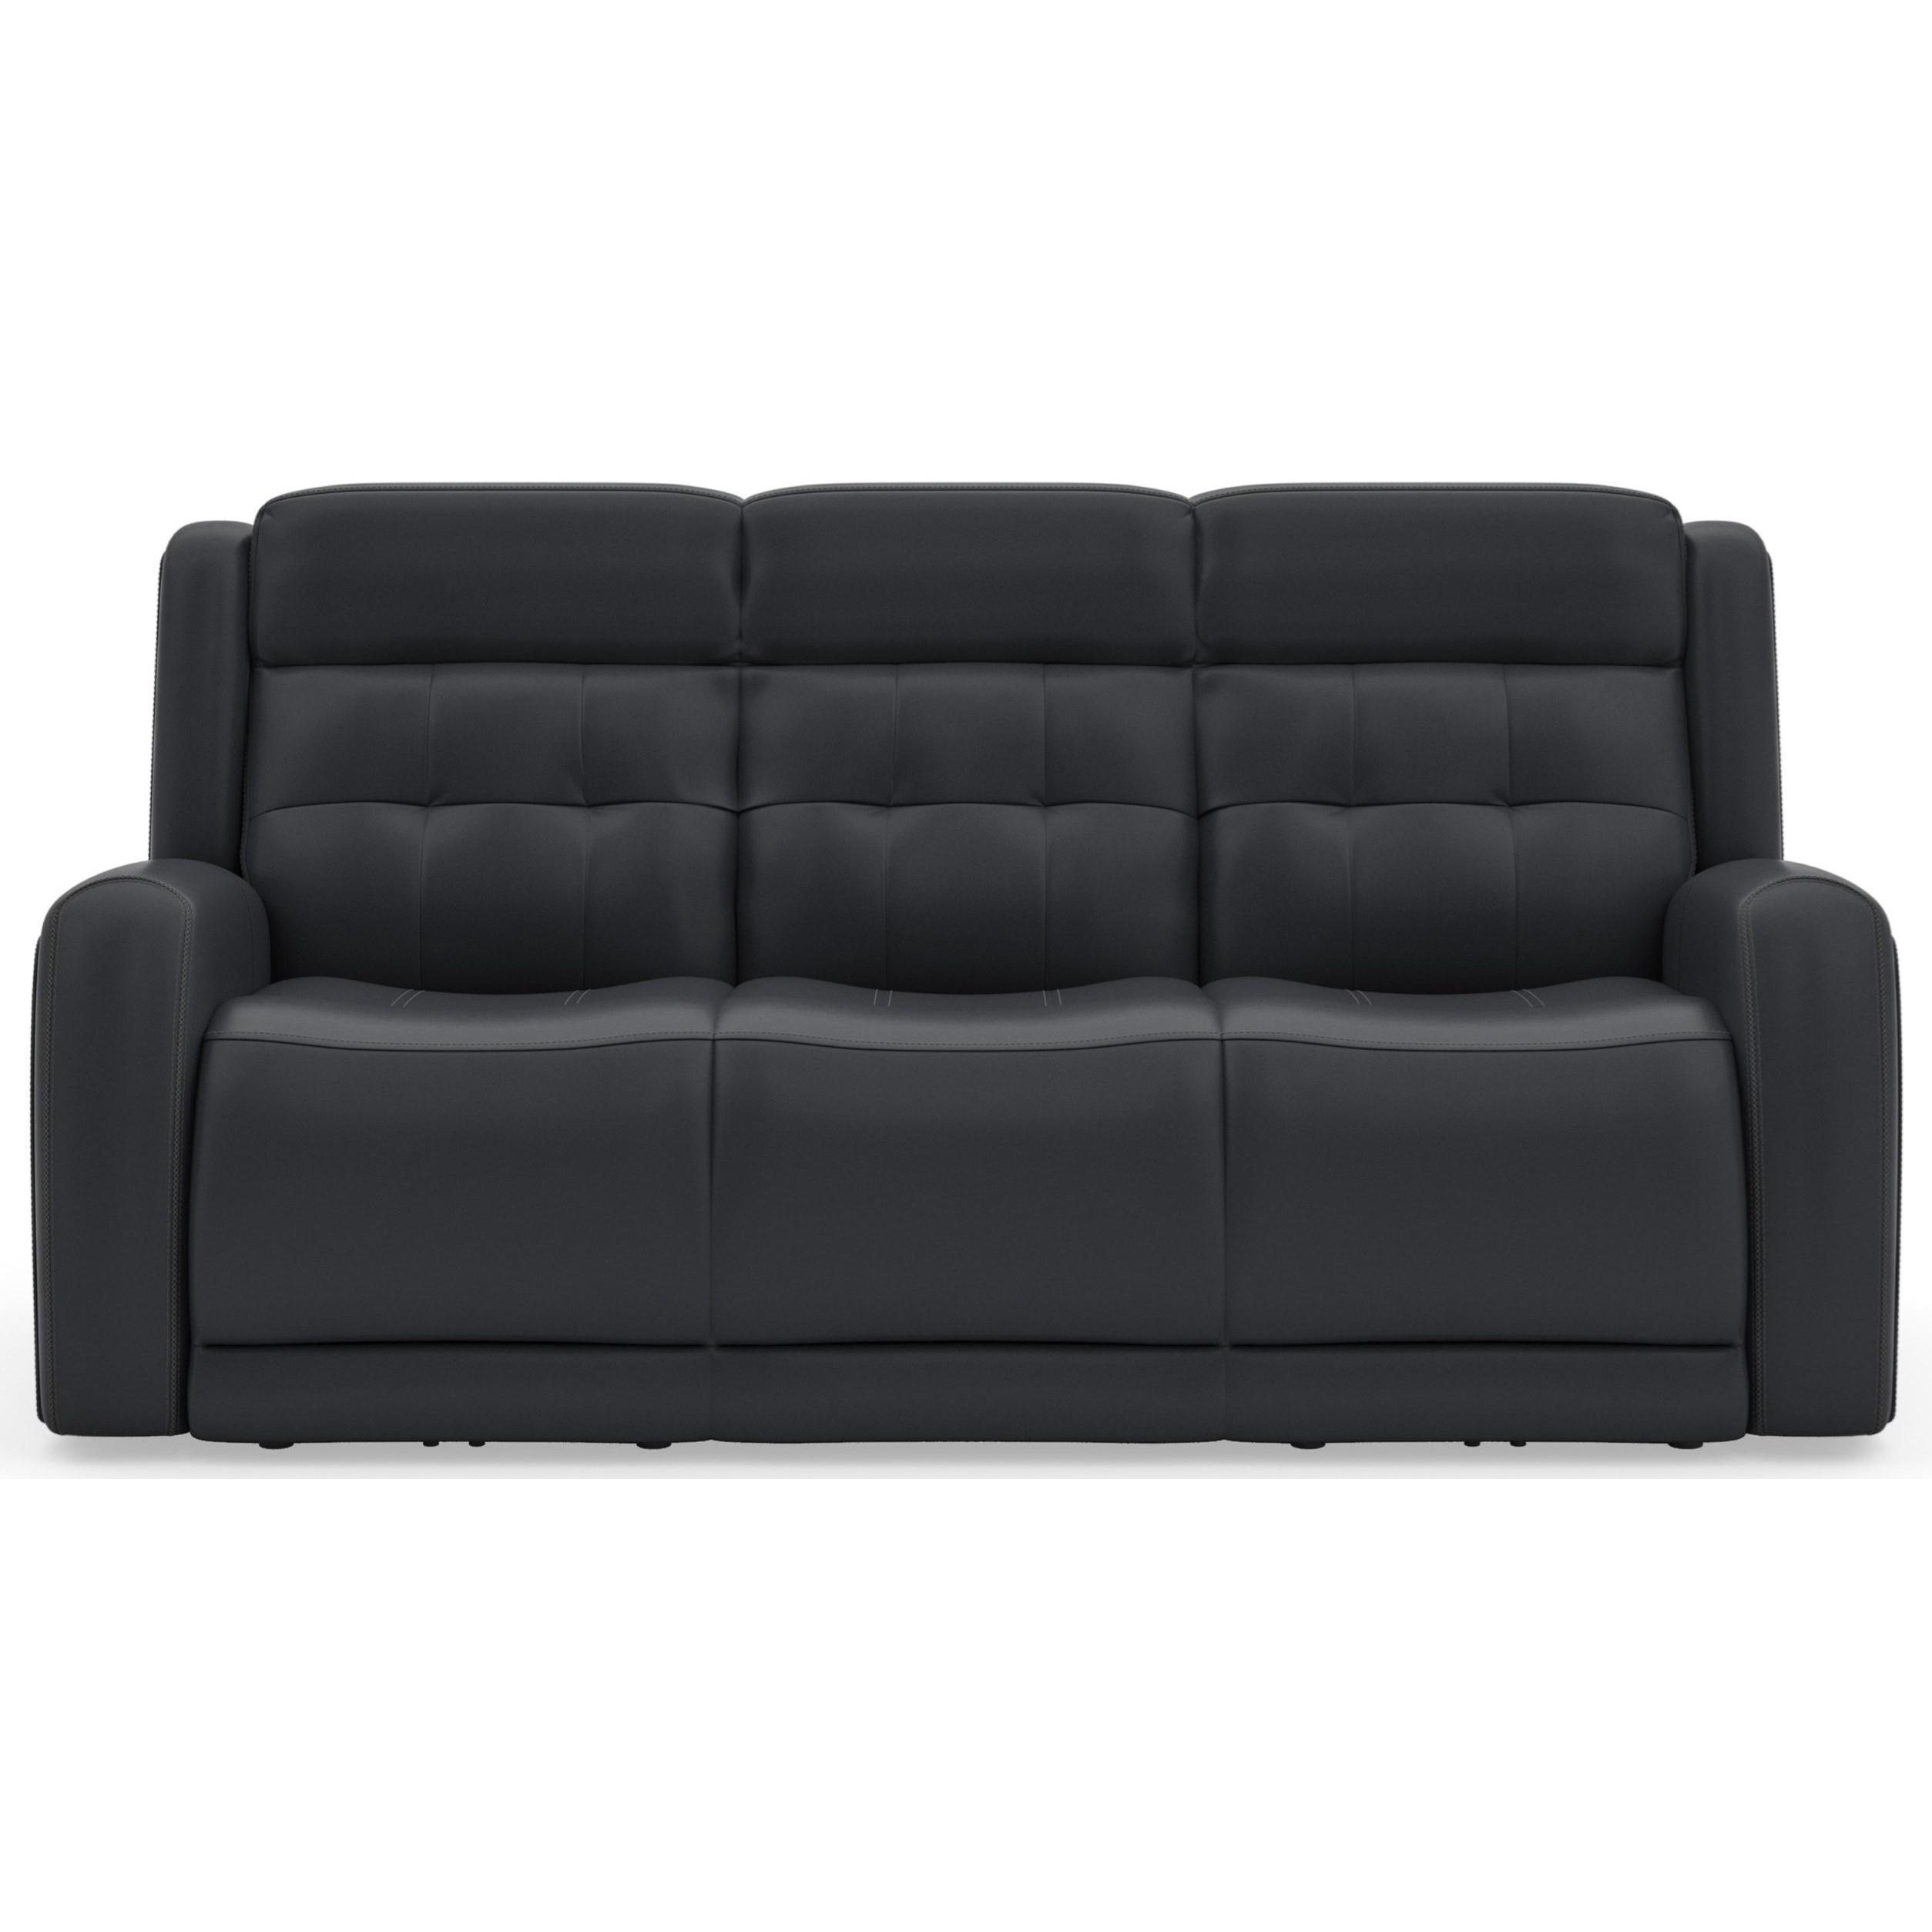 Latitudes - Grant Power Reclining Sofa by Flexsteel at Walker's Furniture